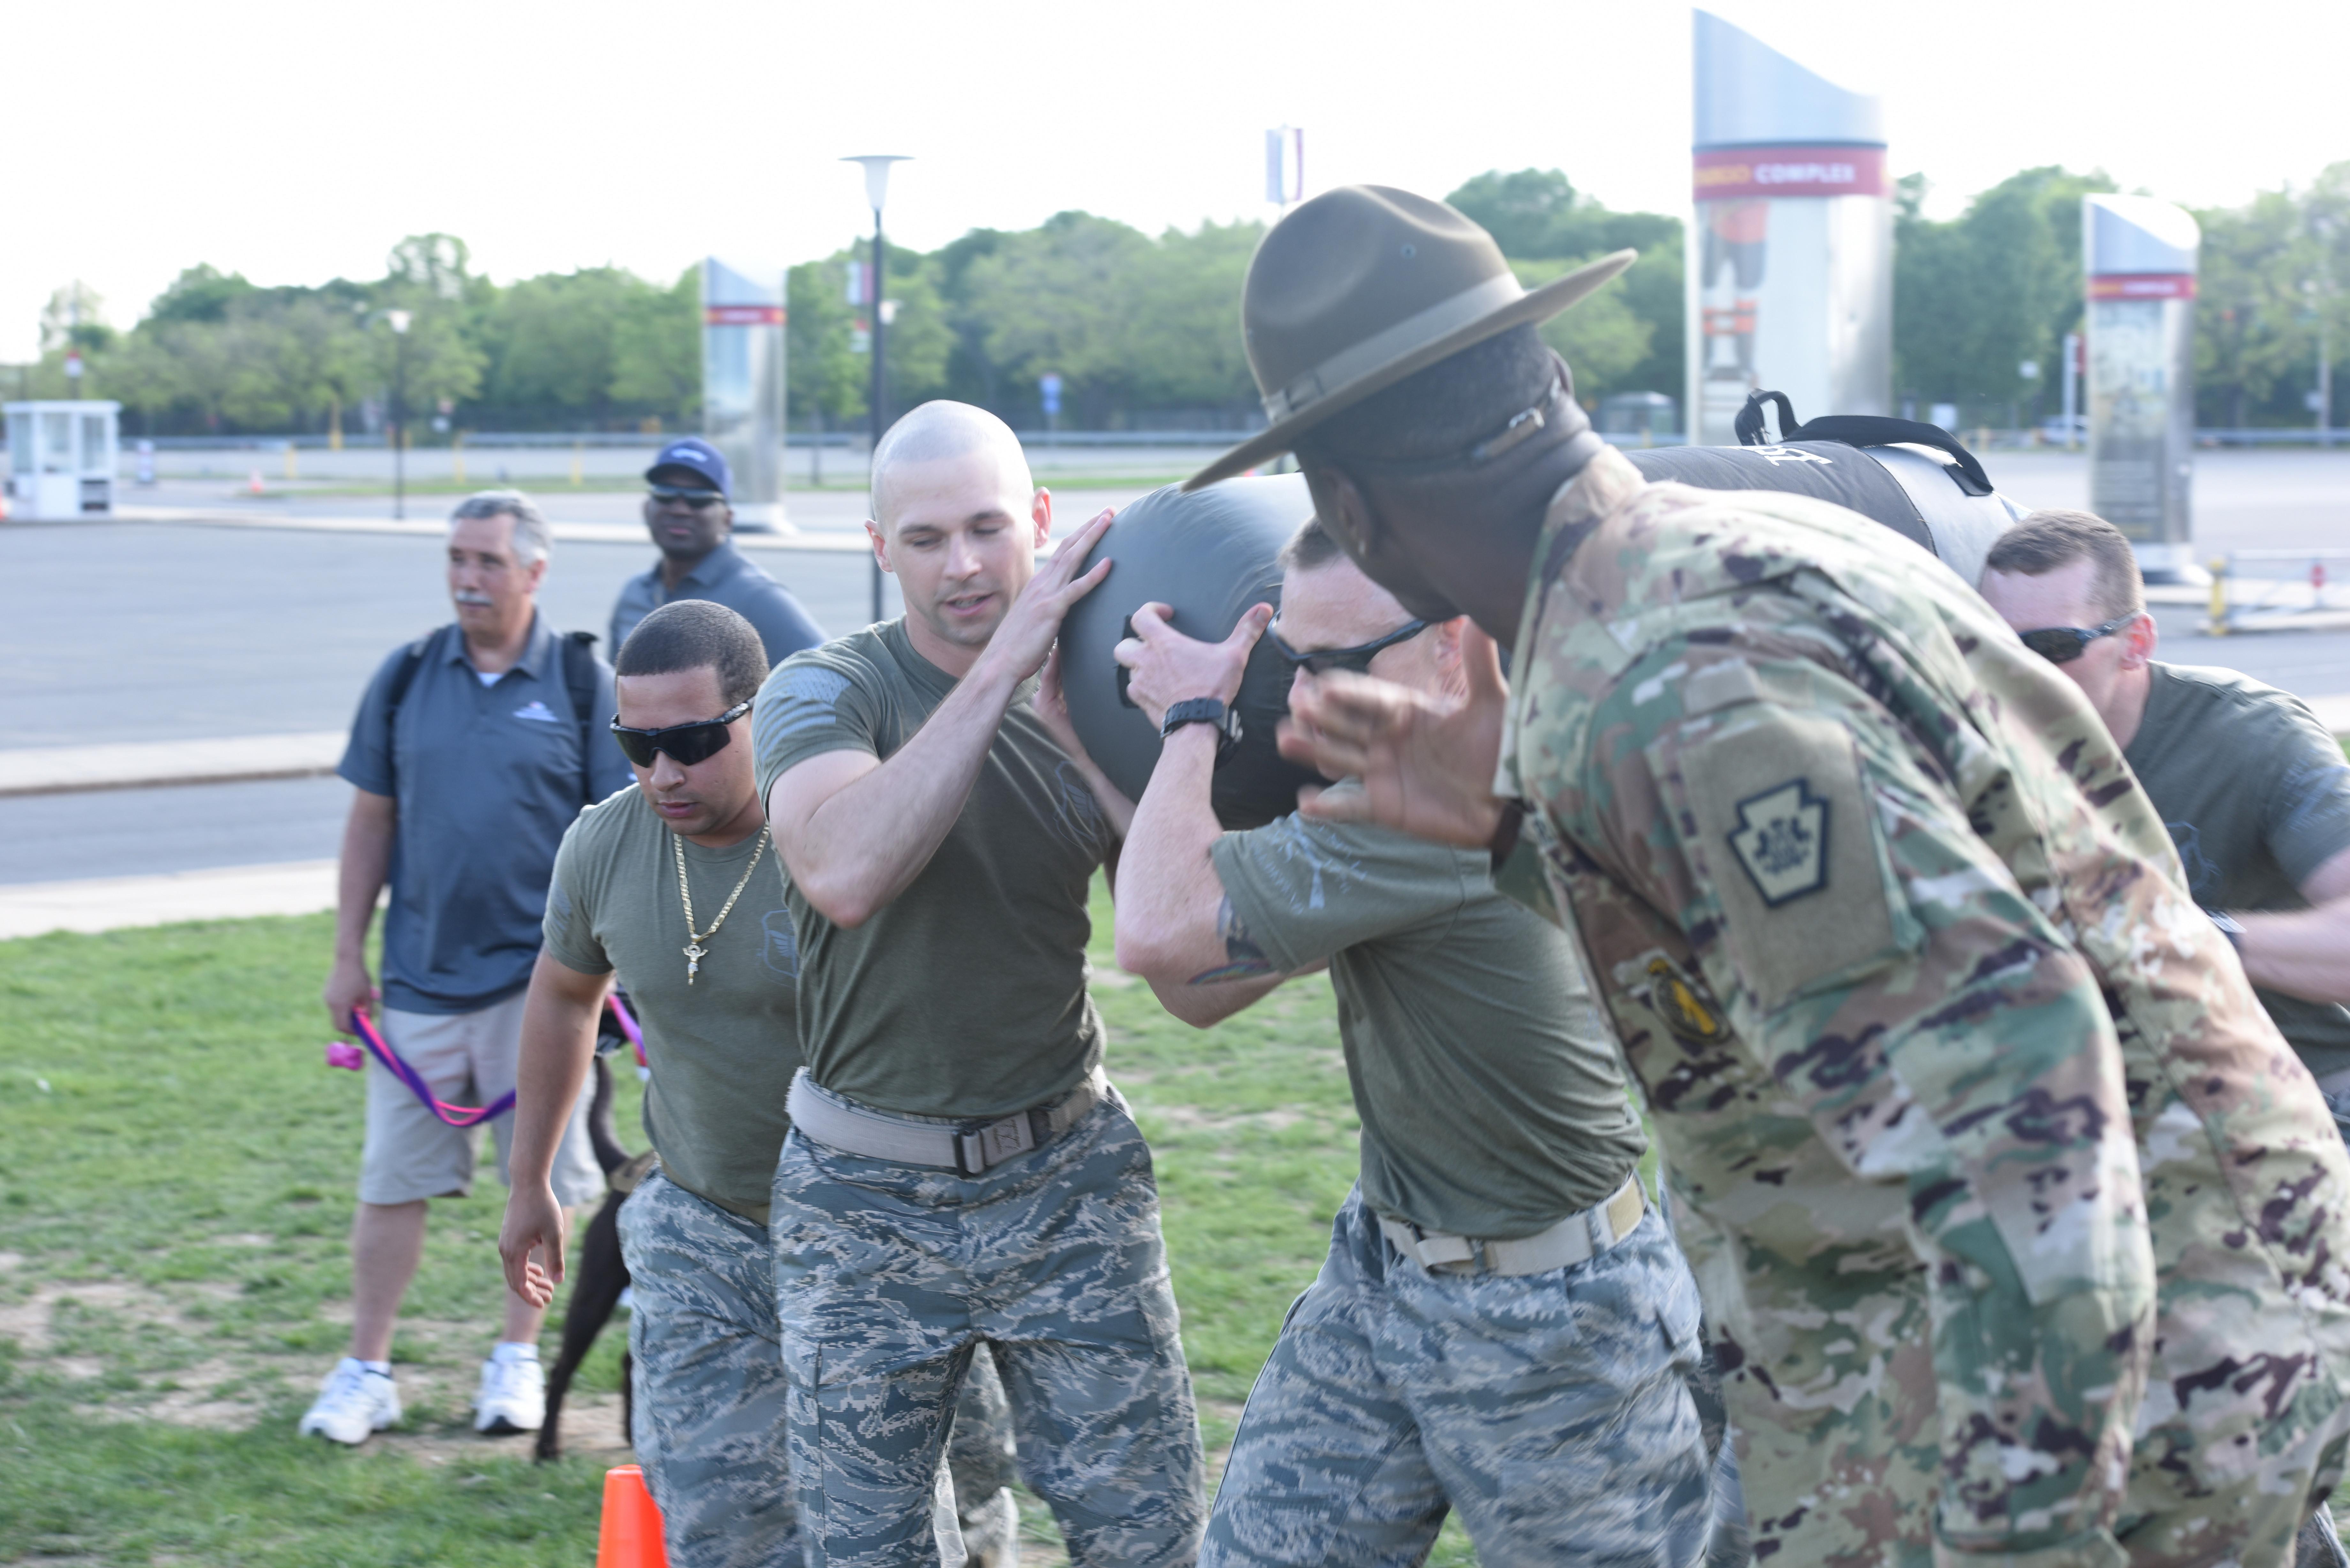 193rd SOSFS Airmen represent Pennsylvania Air National Guard in PT